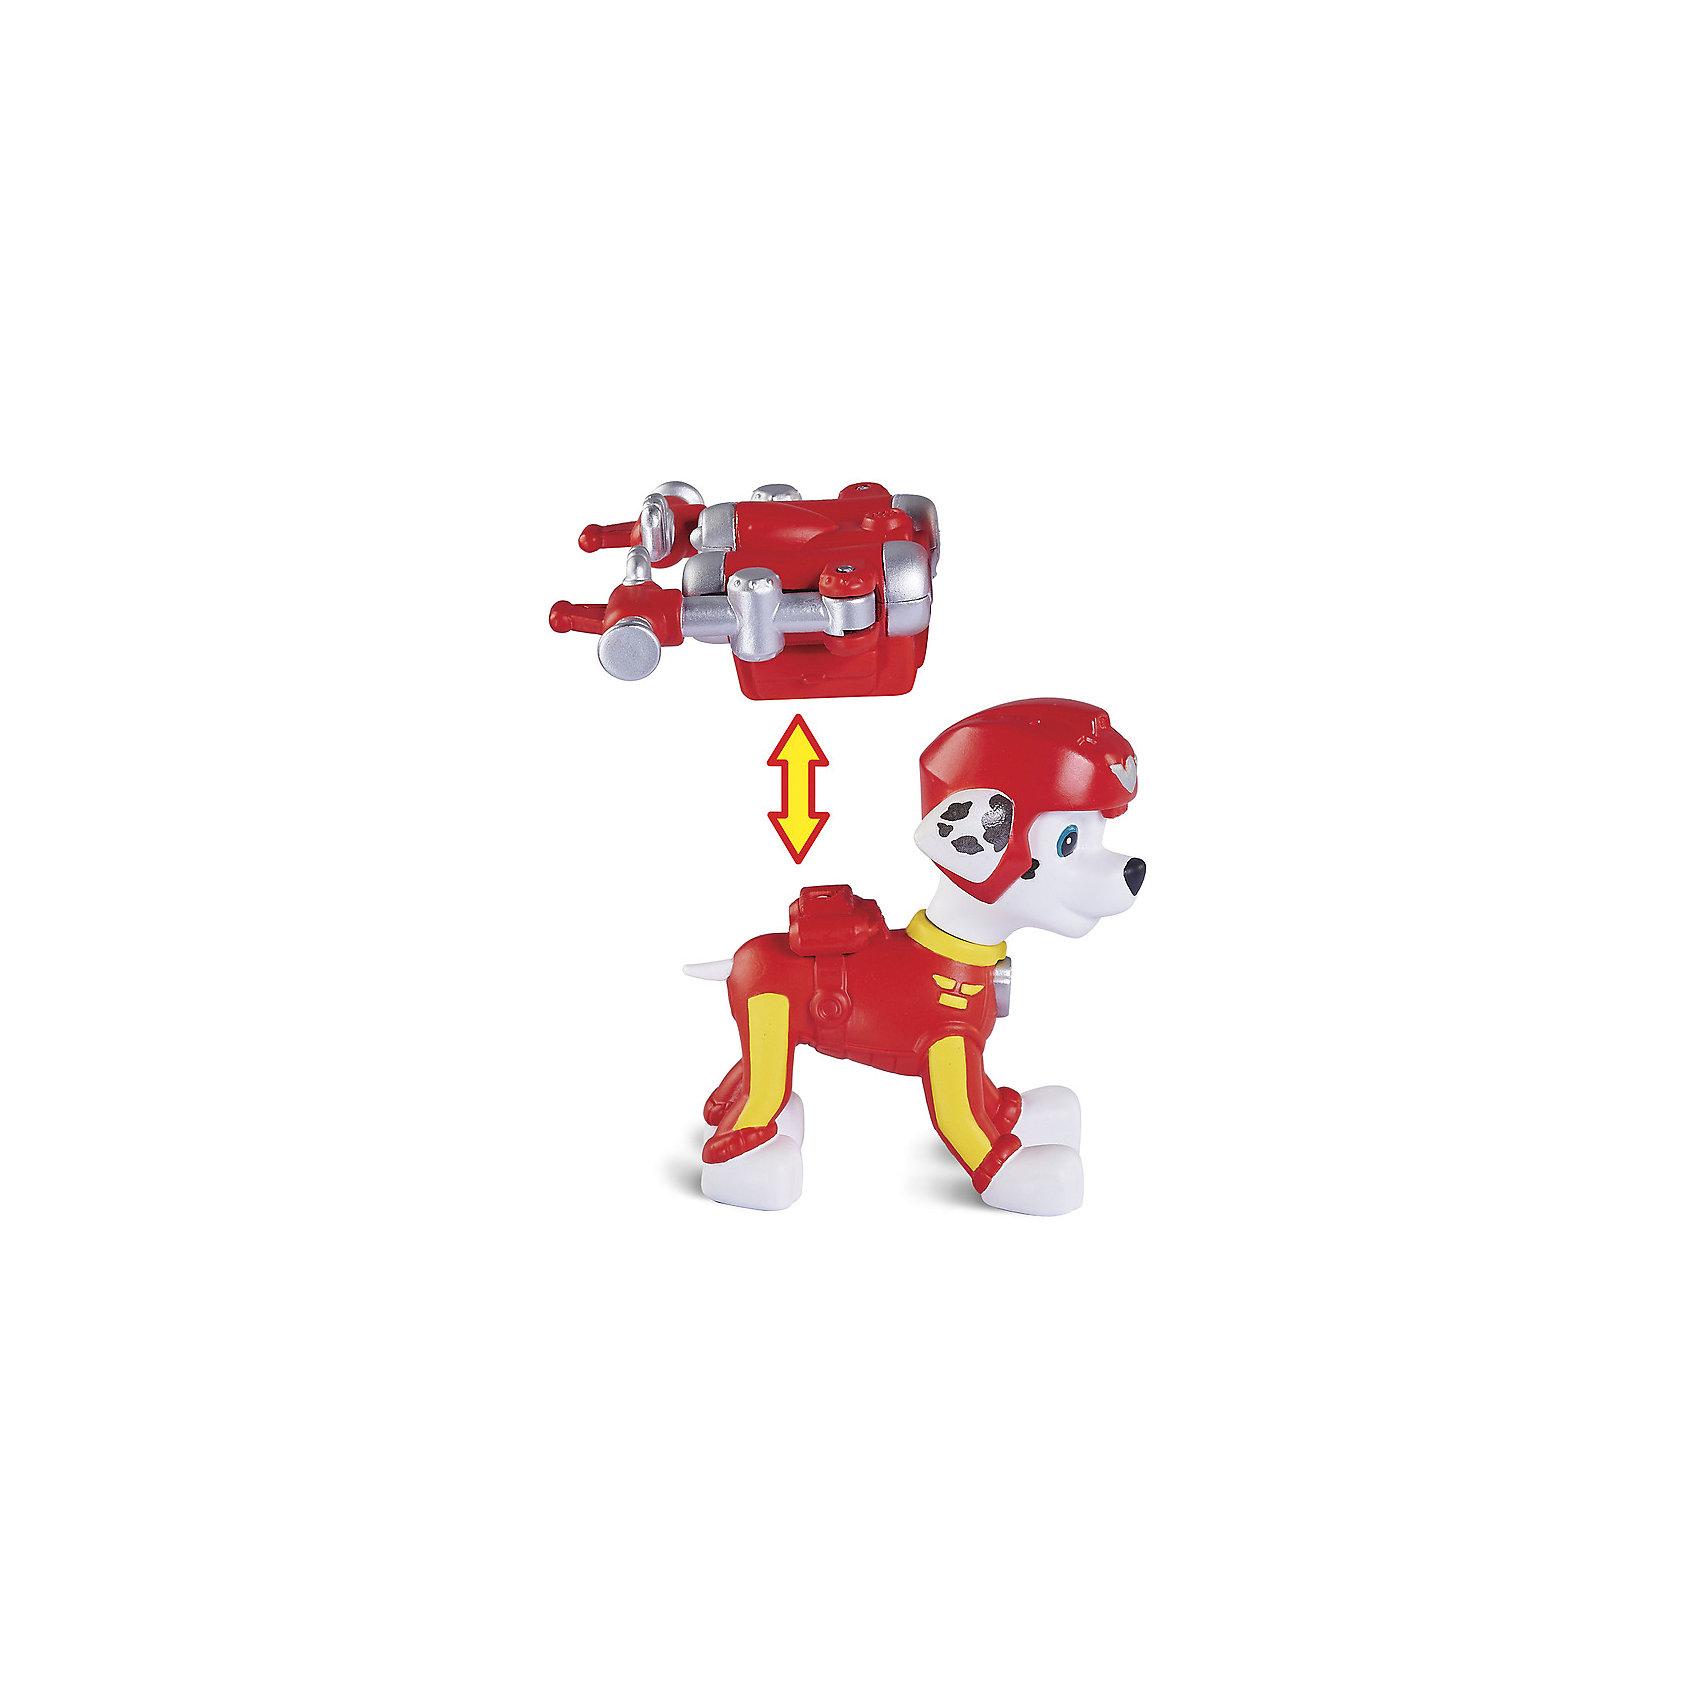 Spin Master Фигурка воздушного спасателя Маршал, Щенячий Патруль spin master фигурка спасателя с рюкзаком трансформером щенячий патруль spin master 20070732 16655